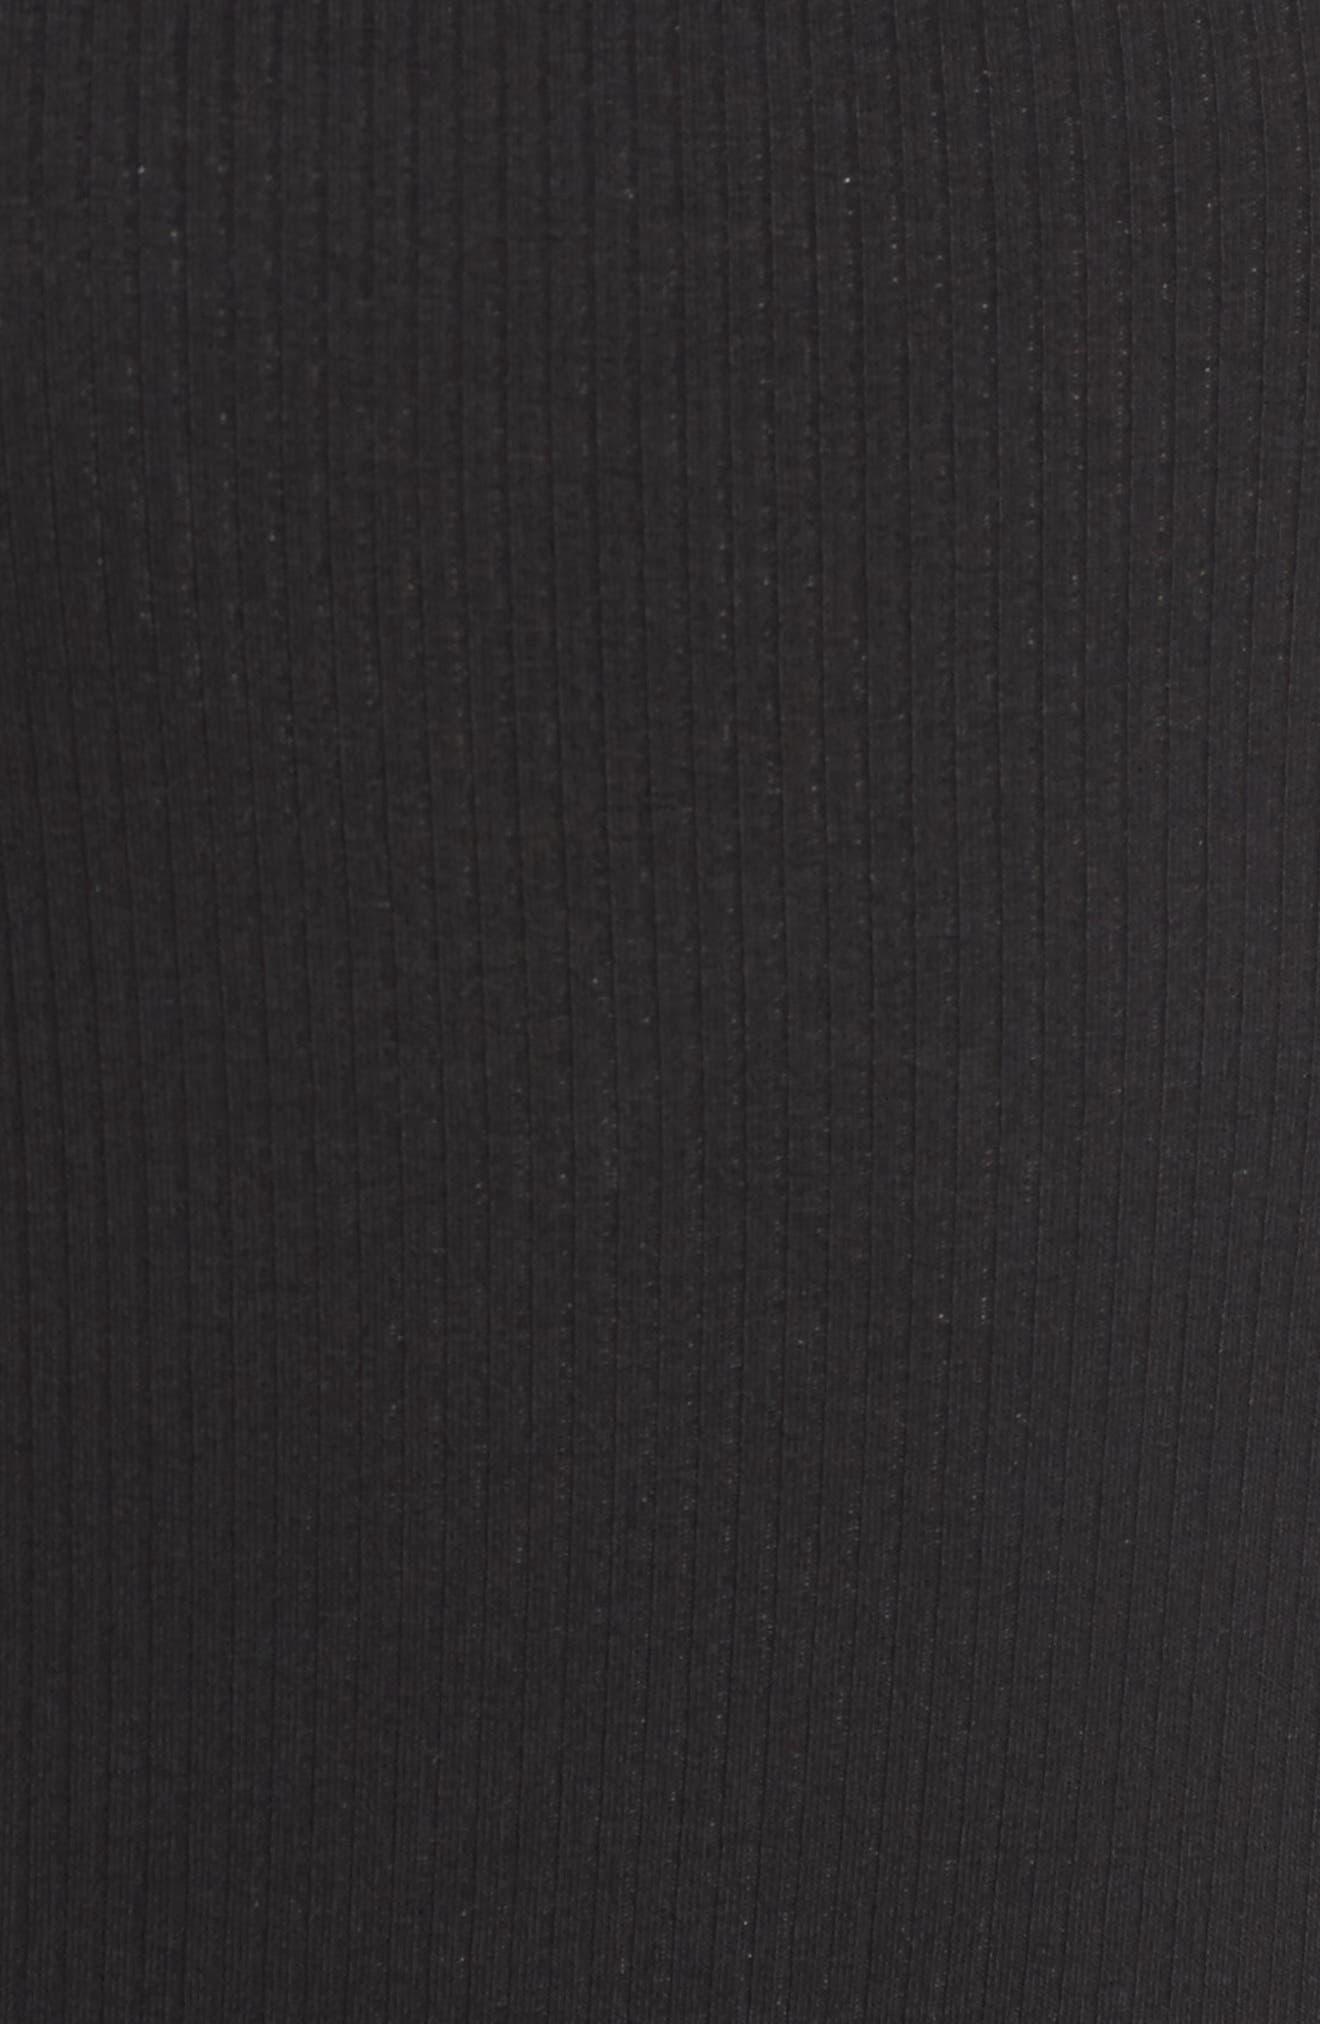 Soto Thong Bodysuit,                             Alternate thumbnail 5, color,                             001